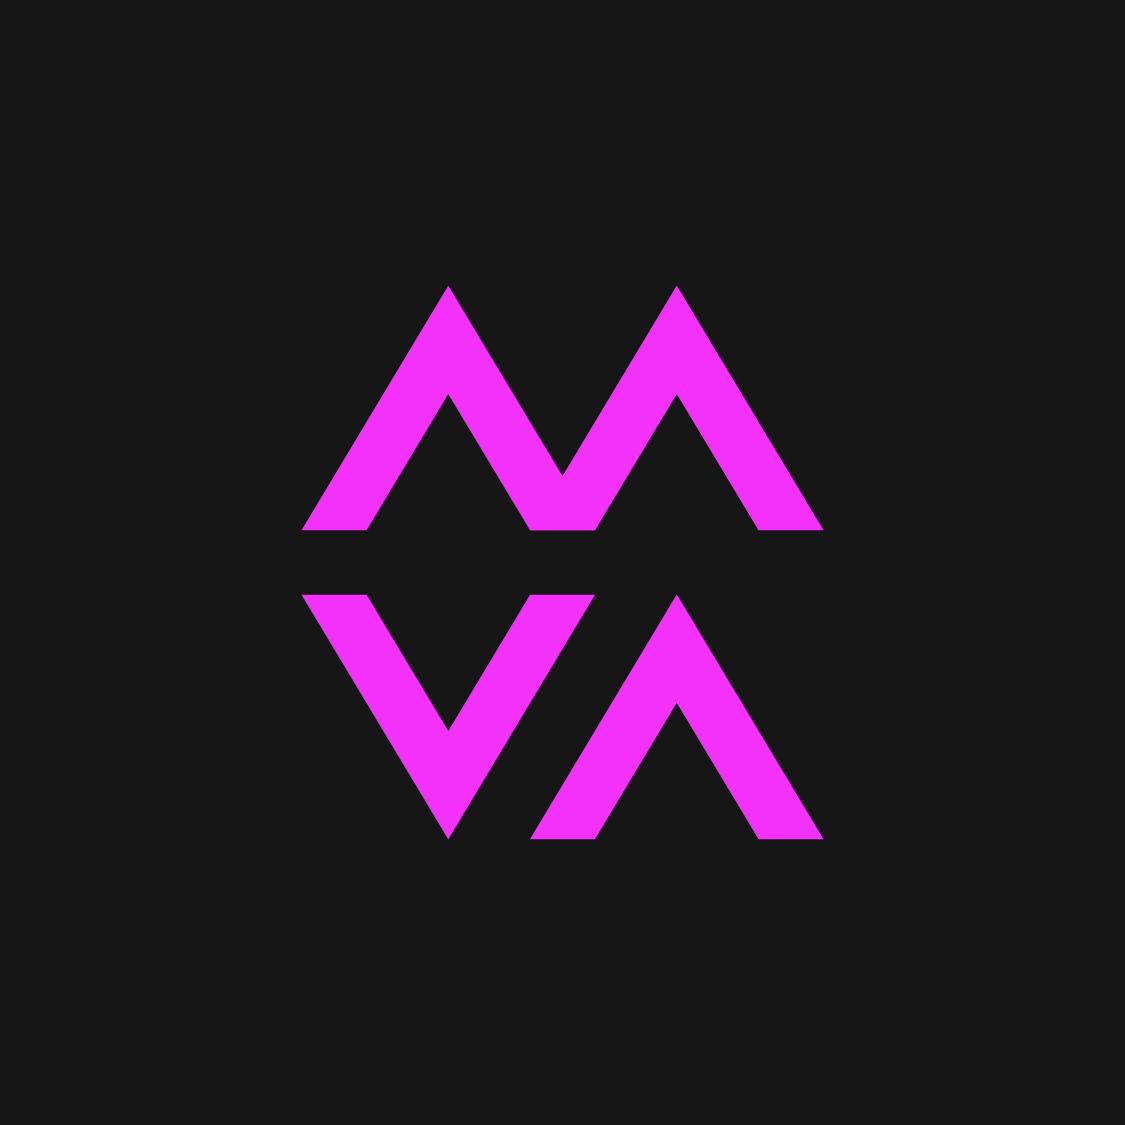 all-logos-2020-19